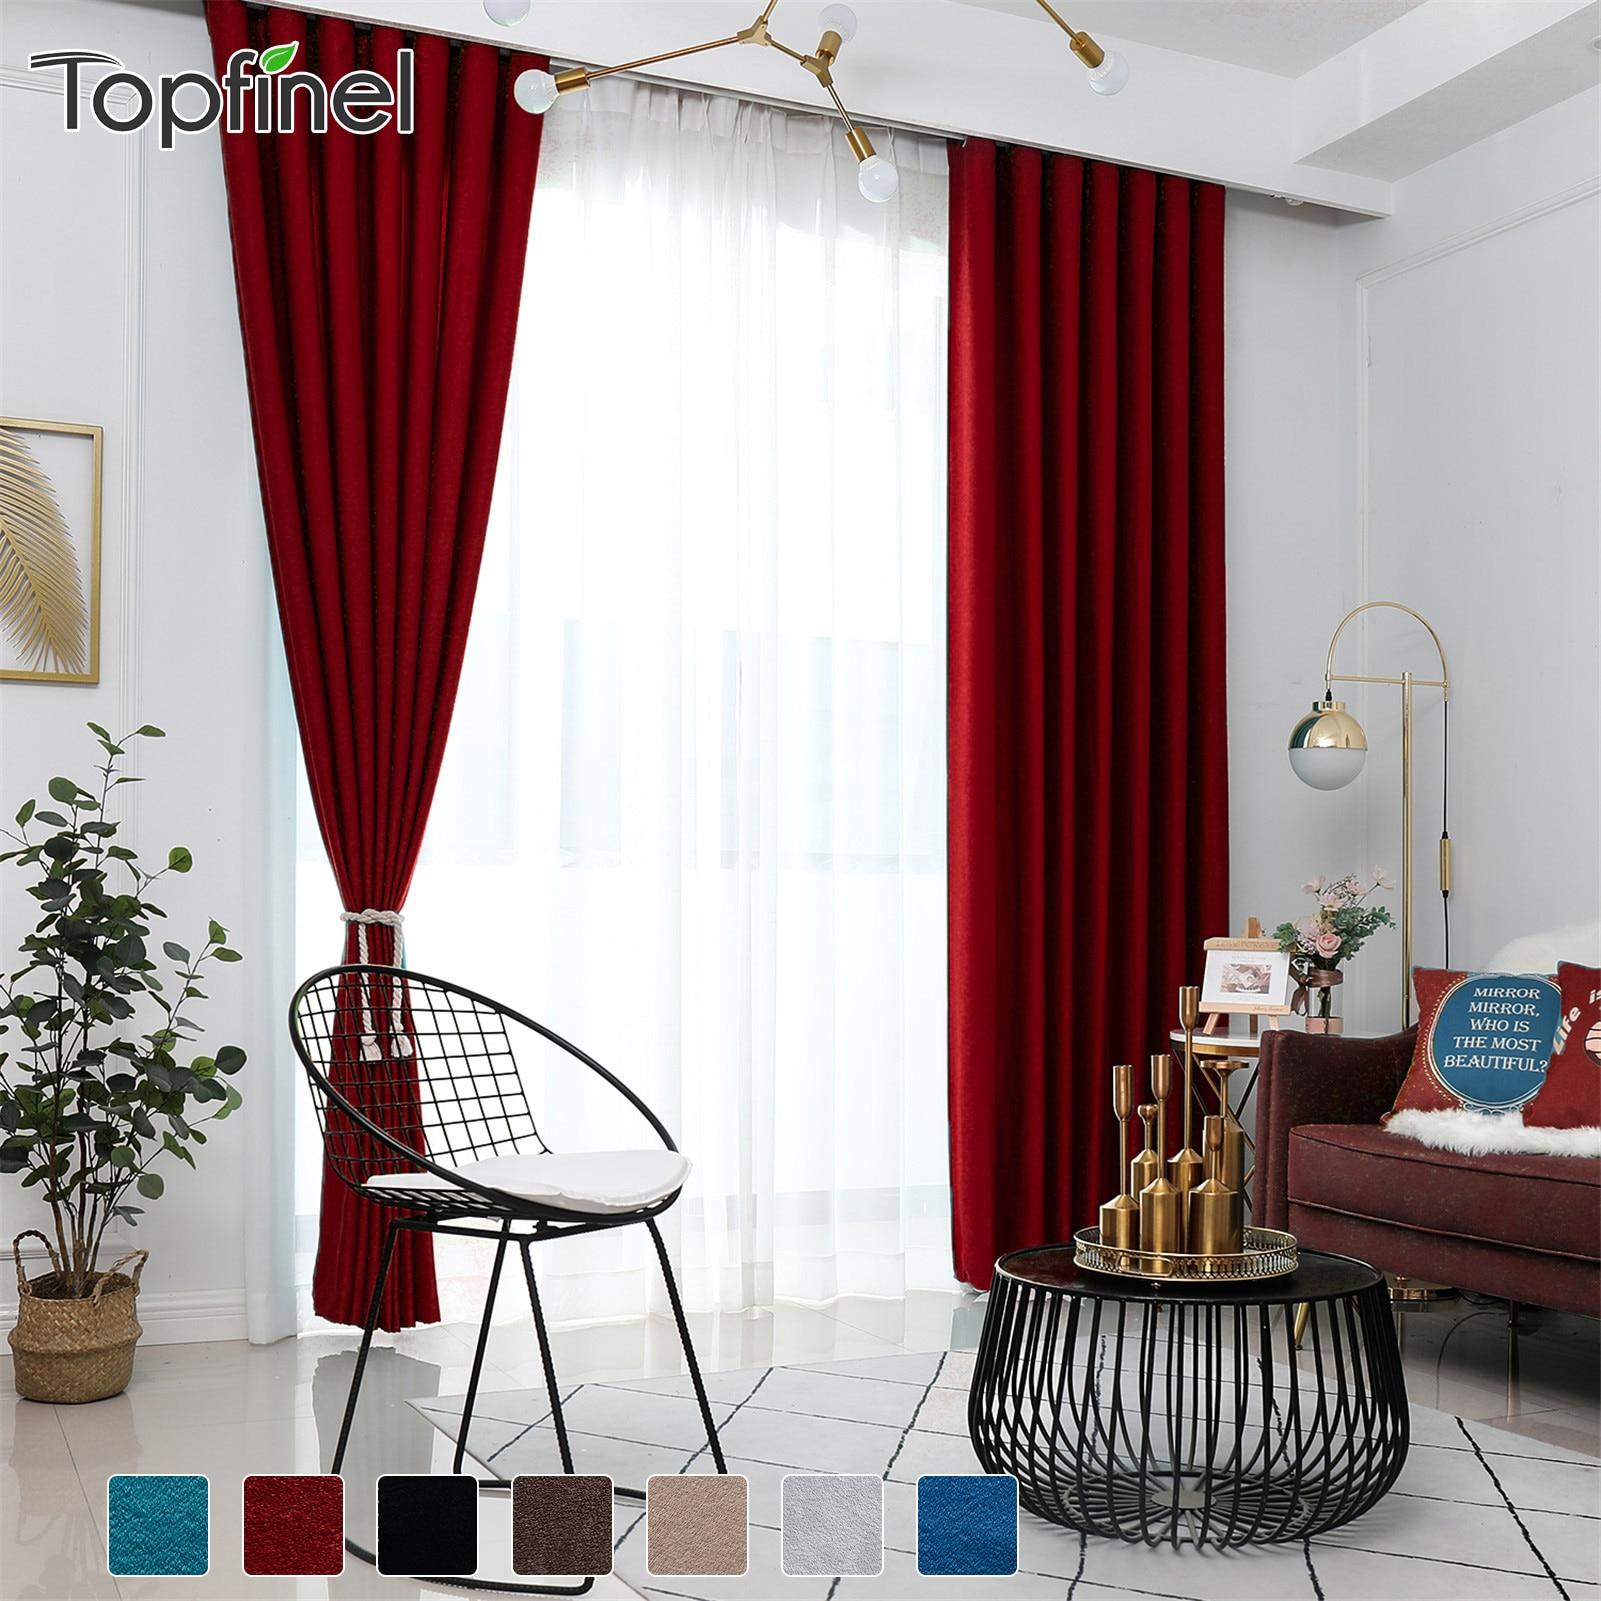 Plain Velvet Cotton Curtains for Living Room Bedroom Door Window Panel Blackout Curtain Drapes Burgundy Grey Black Coffee Brown